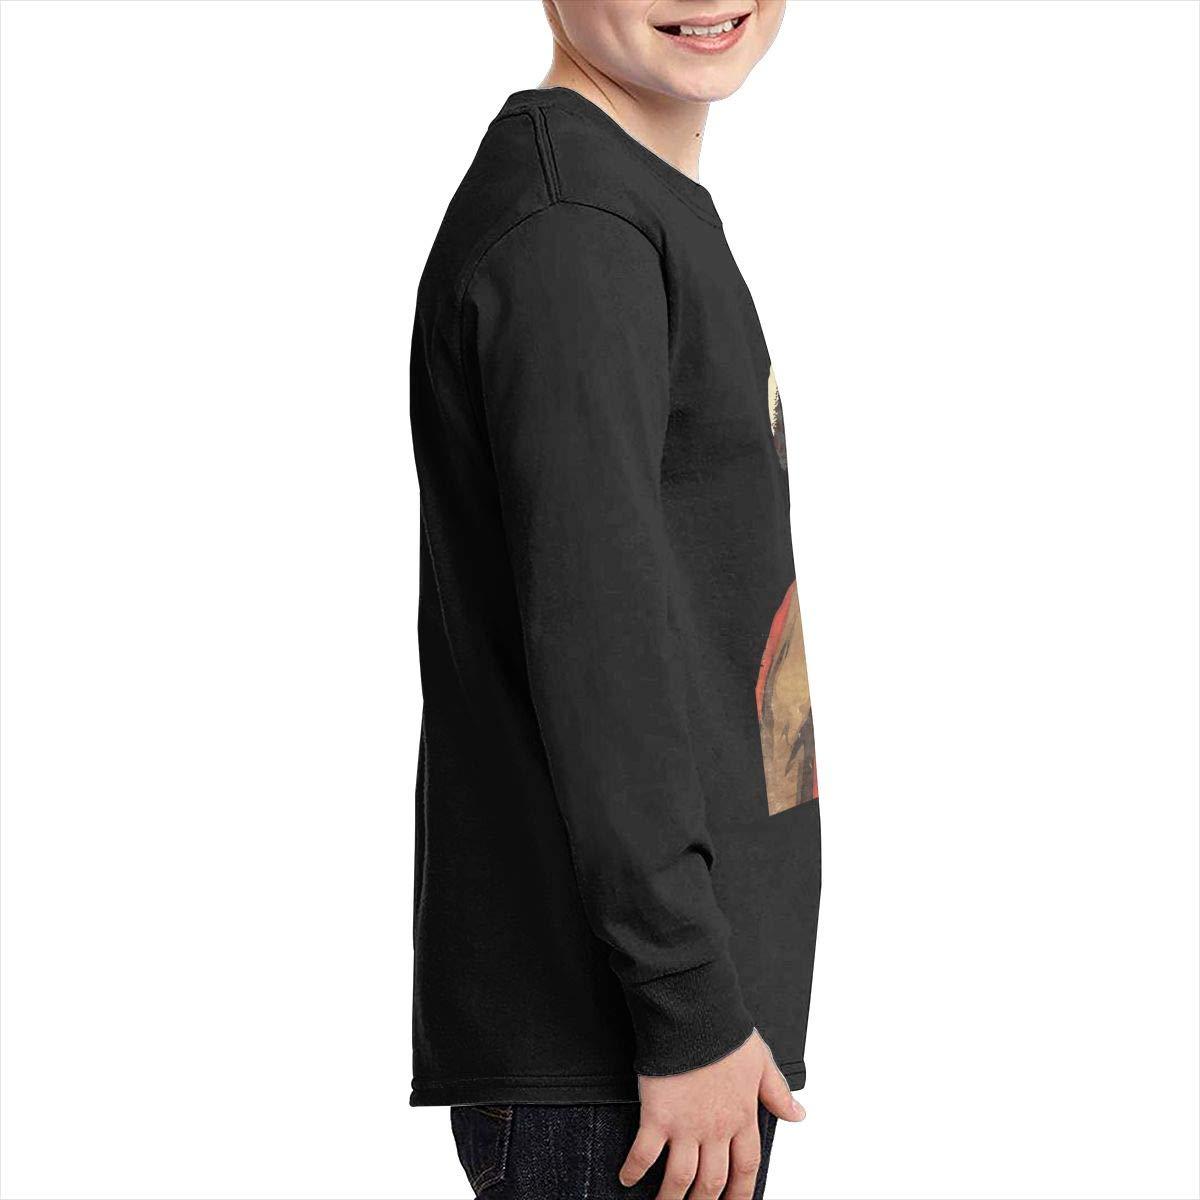 RhteGui Marvin Gaye Boys /& Girls Junior Vintage Long Sleeve T-Shirt Black